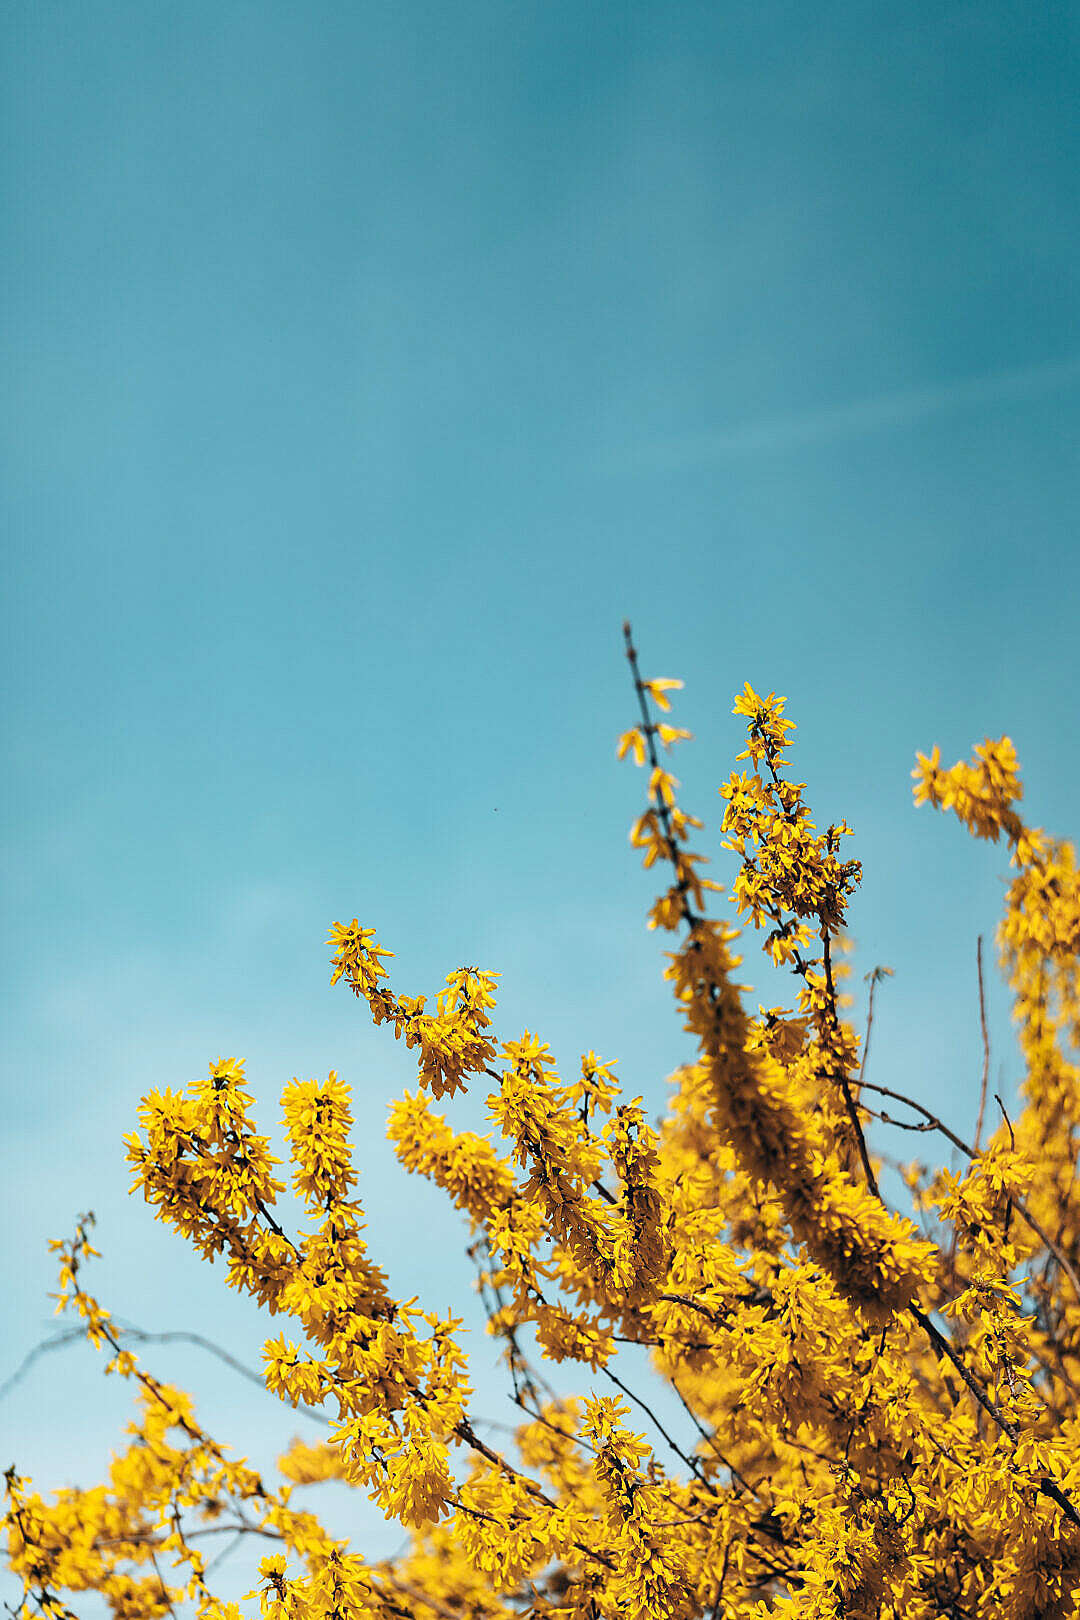 Download Forsythia Bush Against Blue Sky FREE Stock Photo